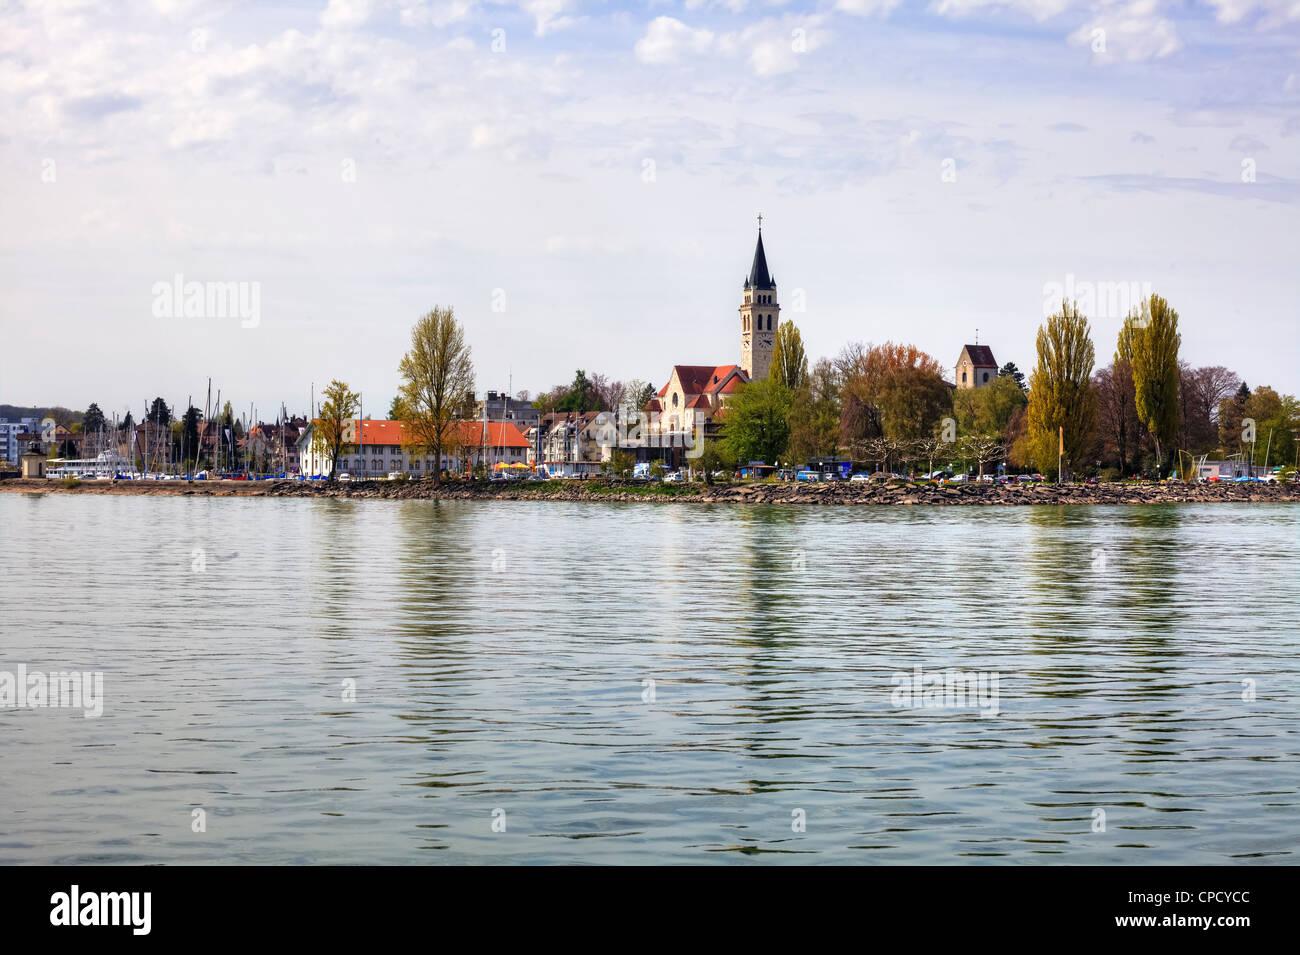 Port Romanshorn, Thurgau, Switzerland - Stock Image